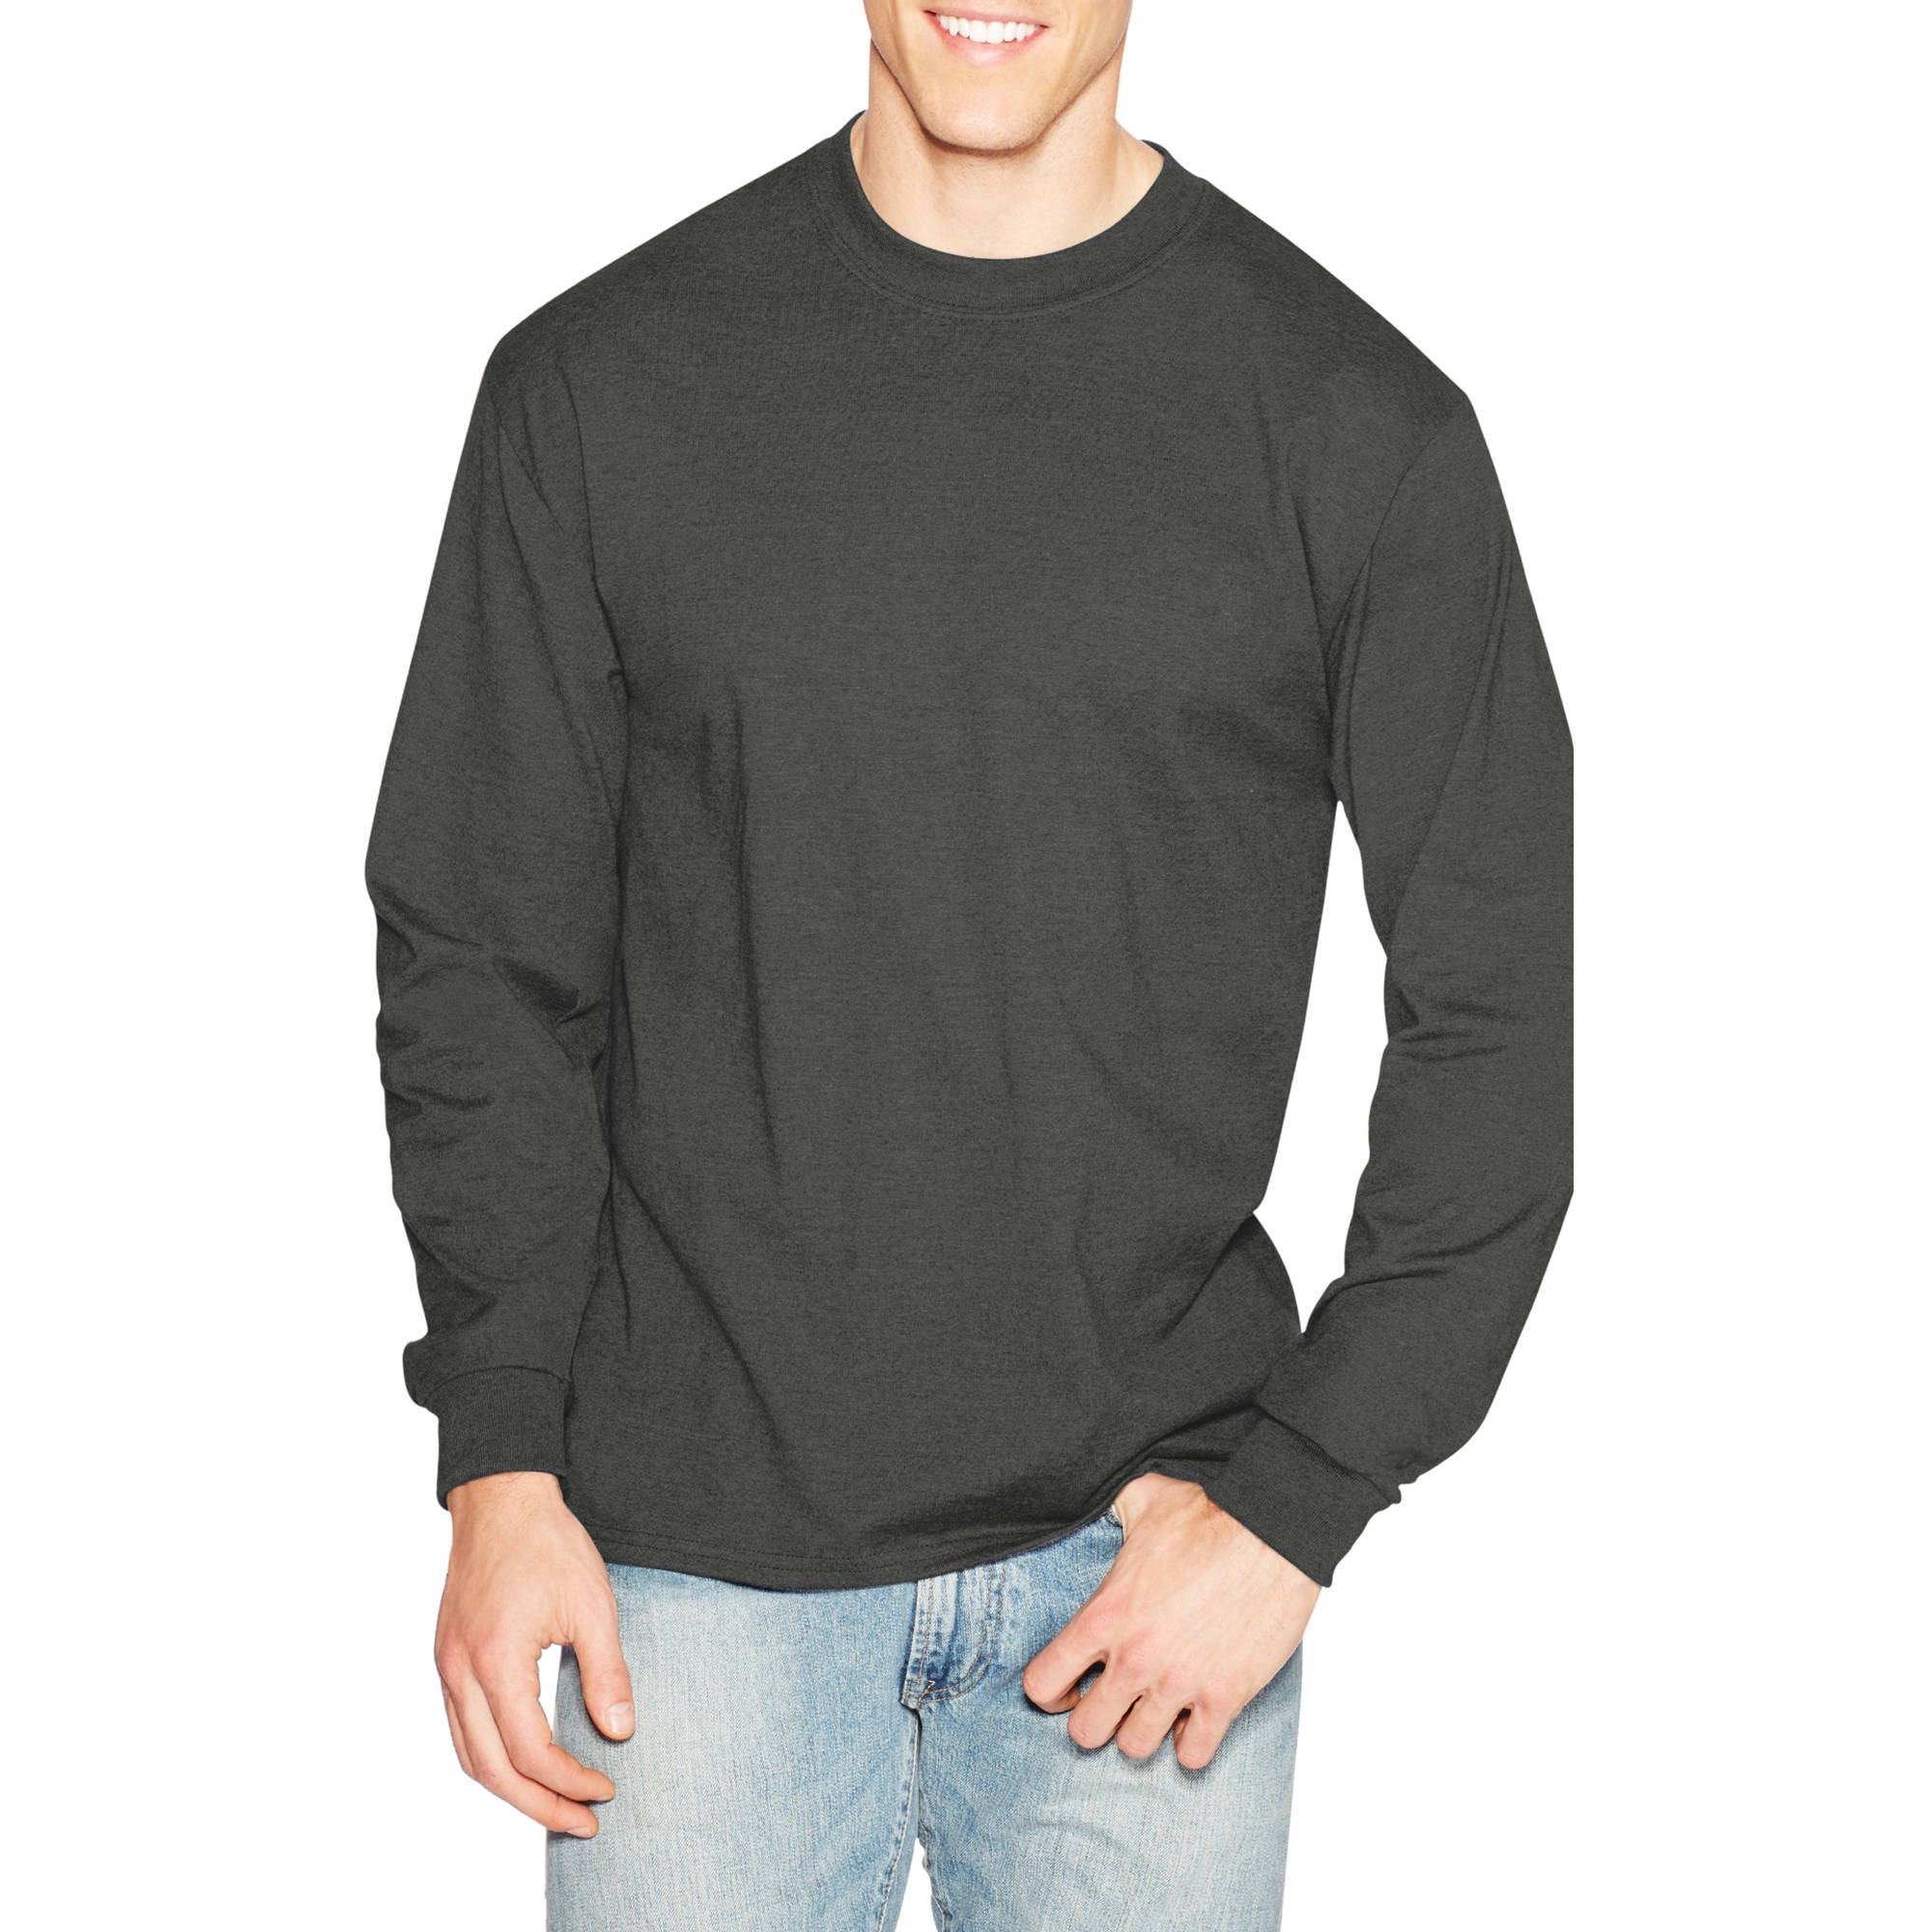 Hanes Mens Premium Beefy-T Cotton Long Sleeve T-Shirt